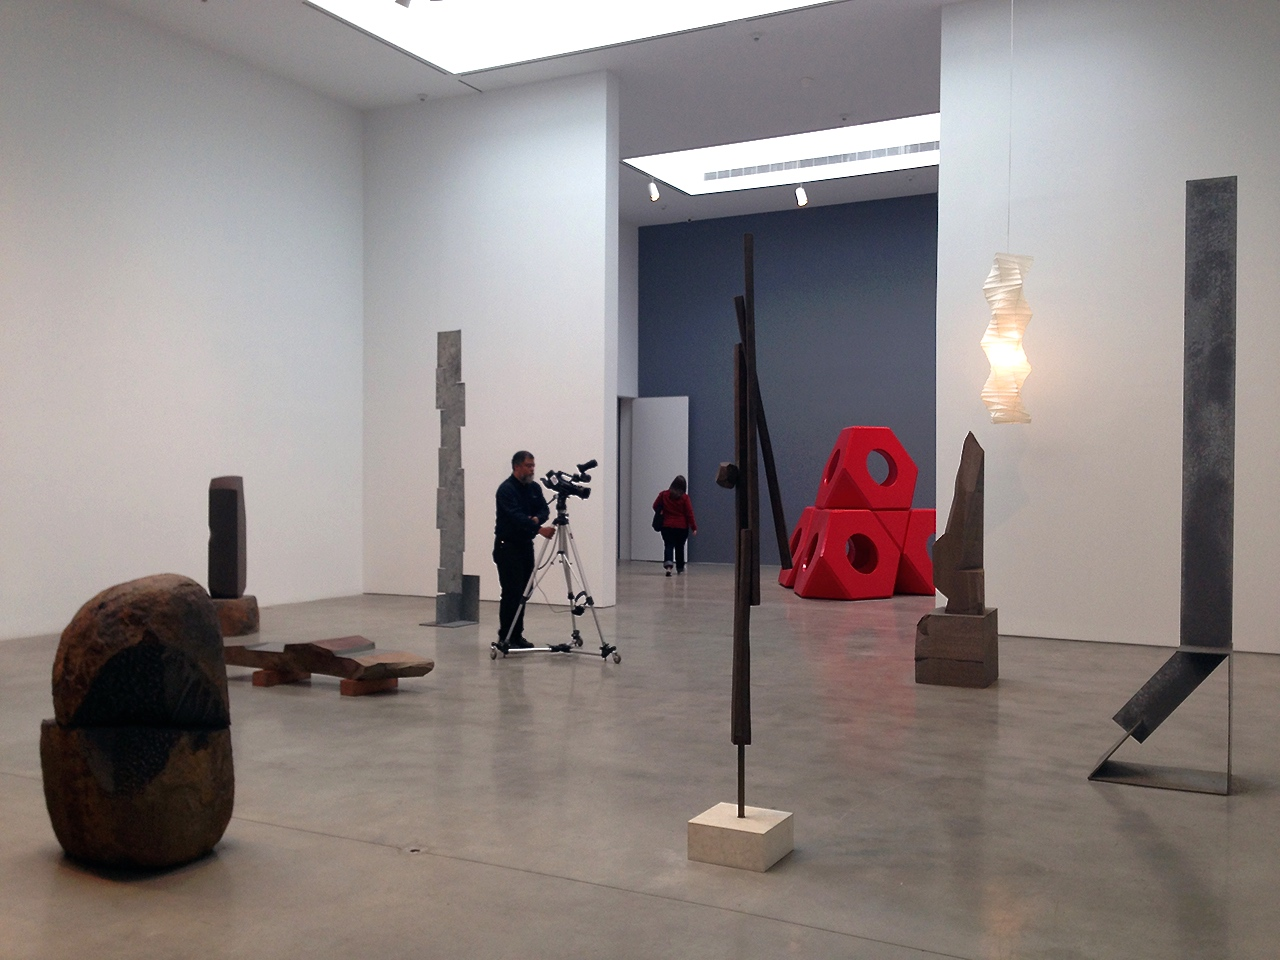 Installation view, 'Isamu Noguchi: Variatons' at Pace Gallery